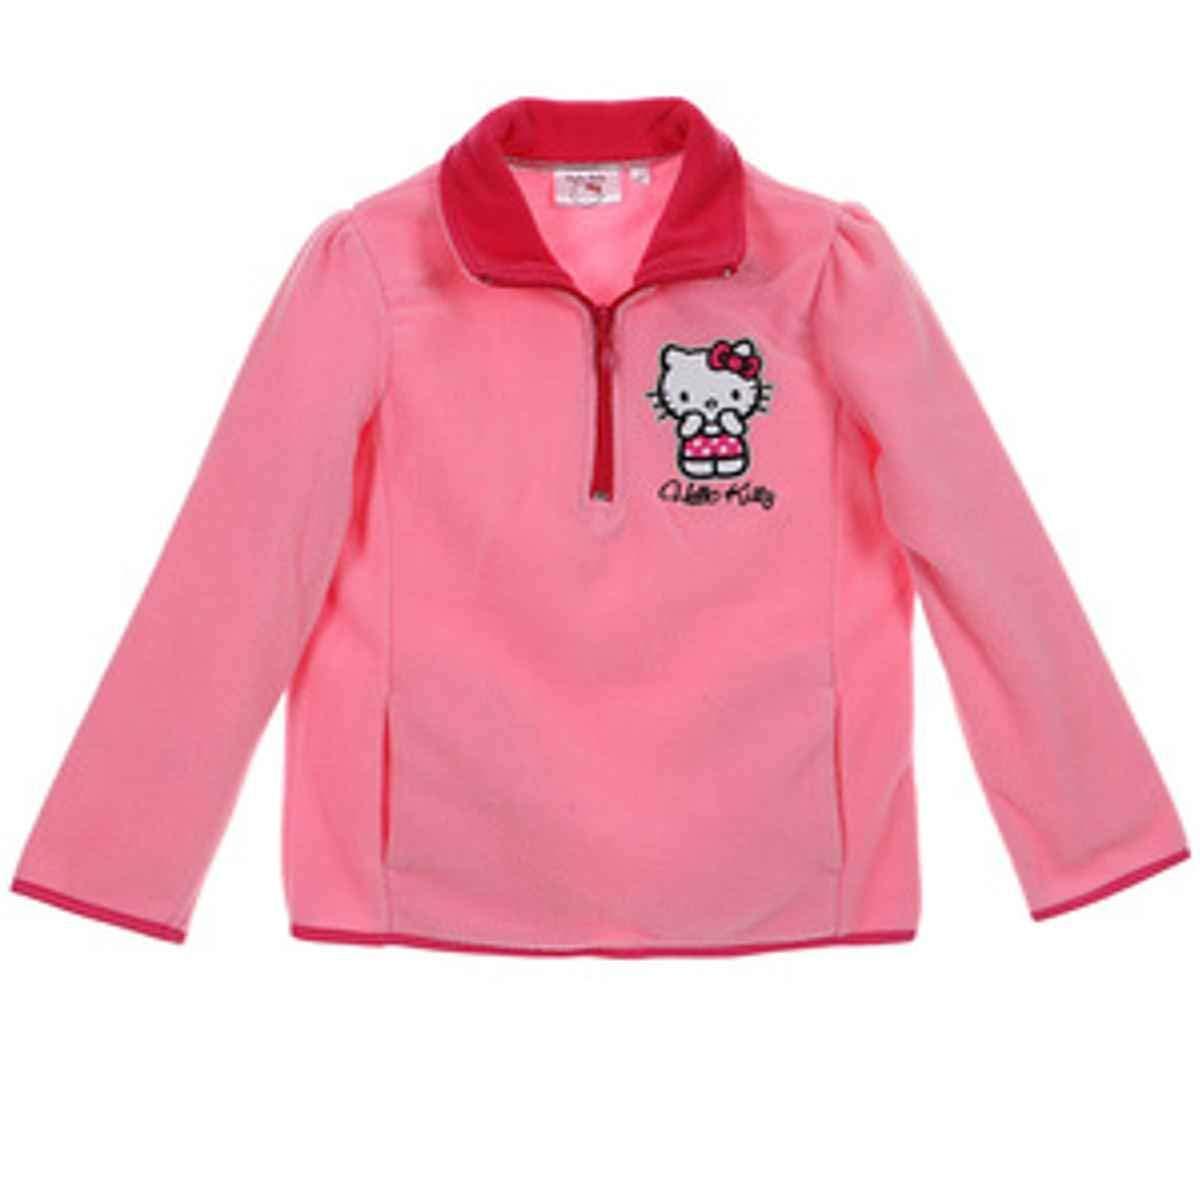 Girls Hello Kitty Fleece Top